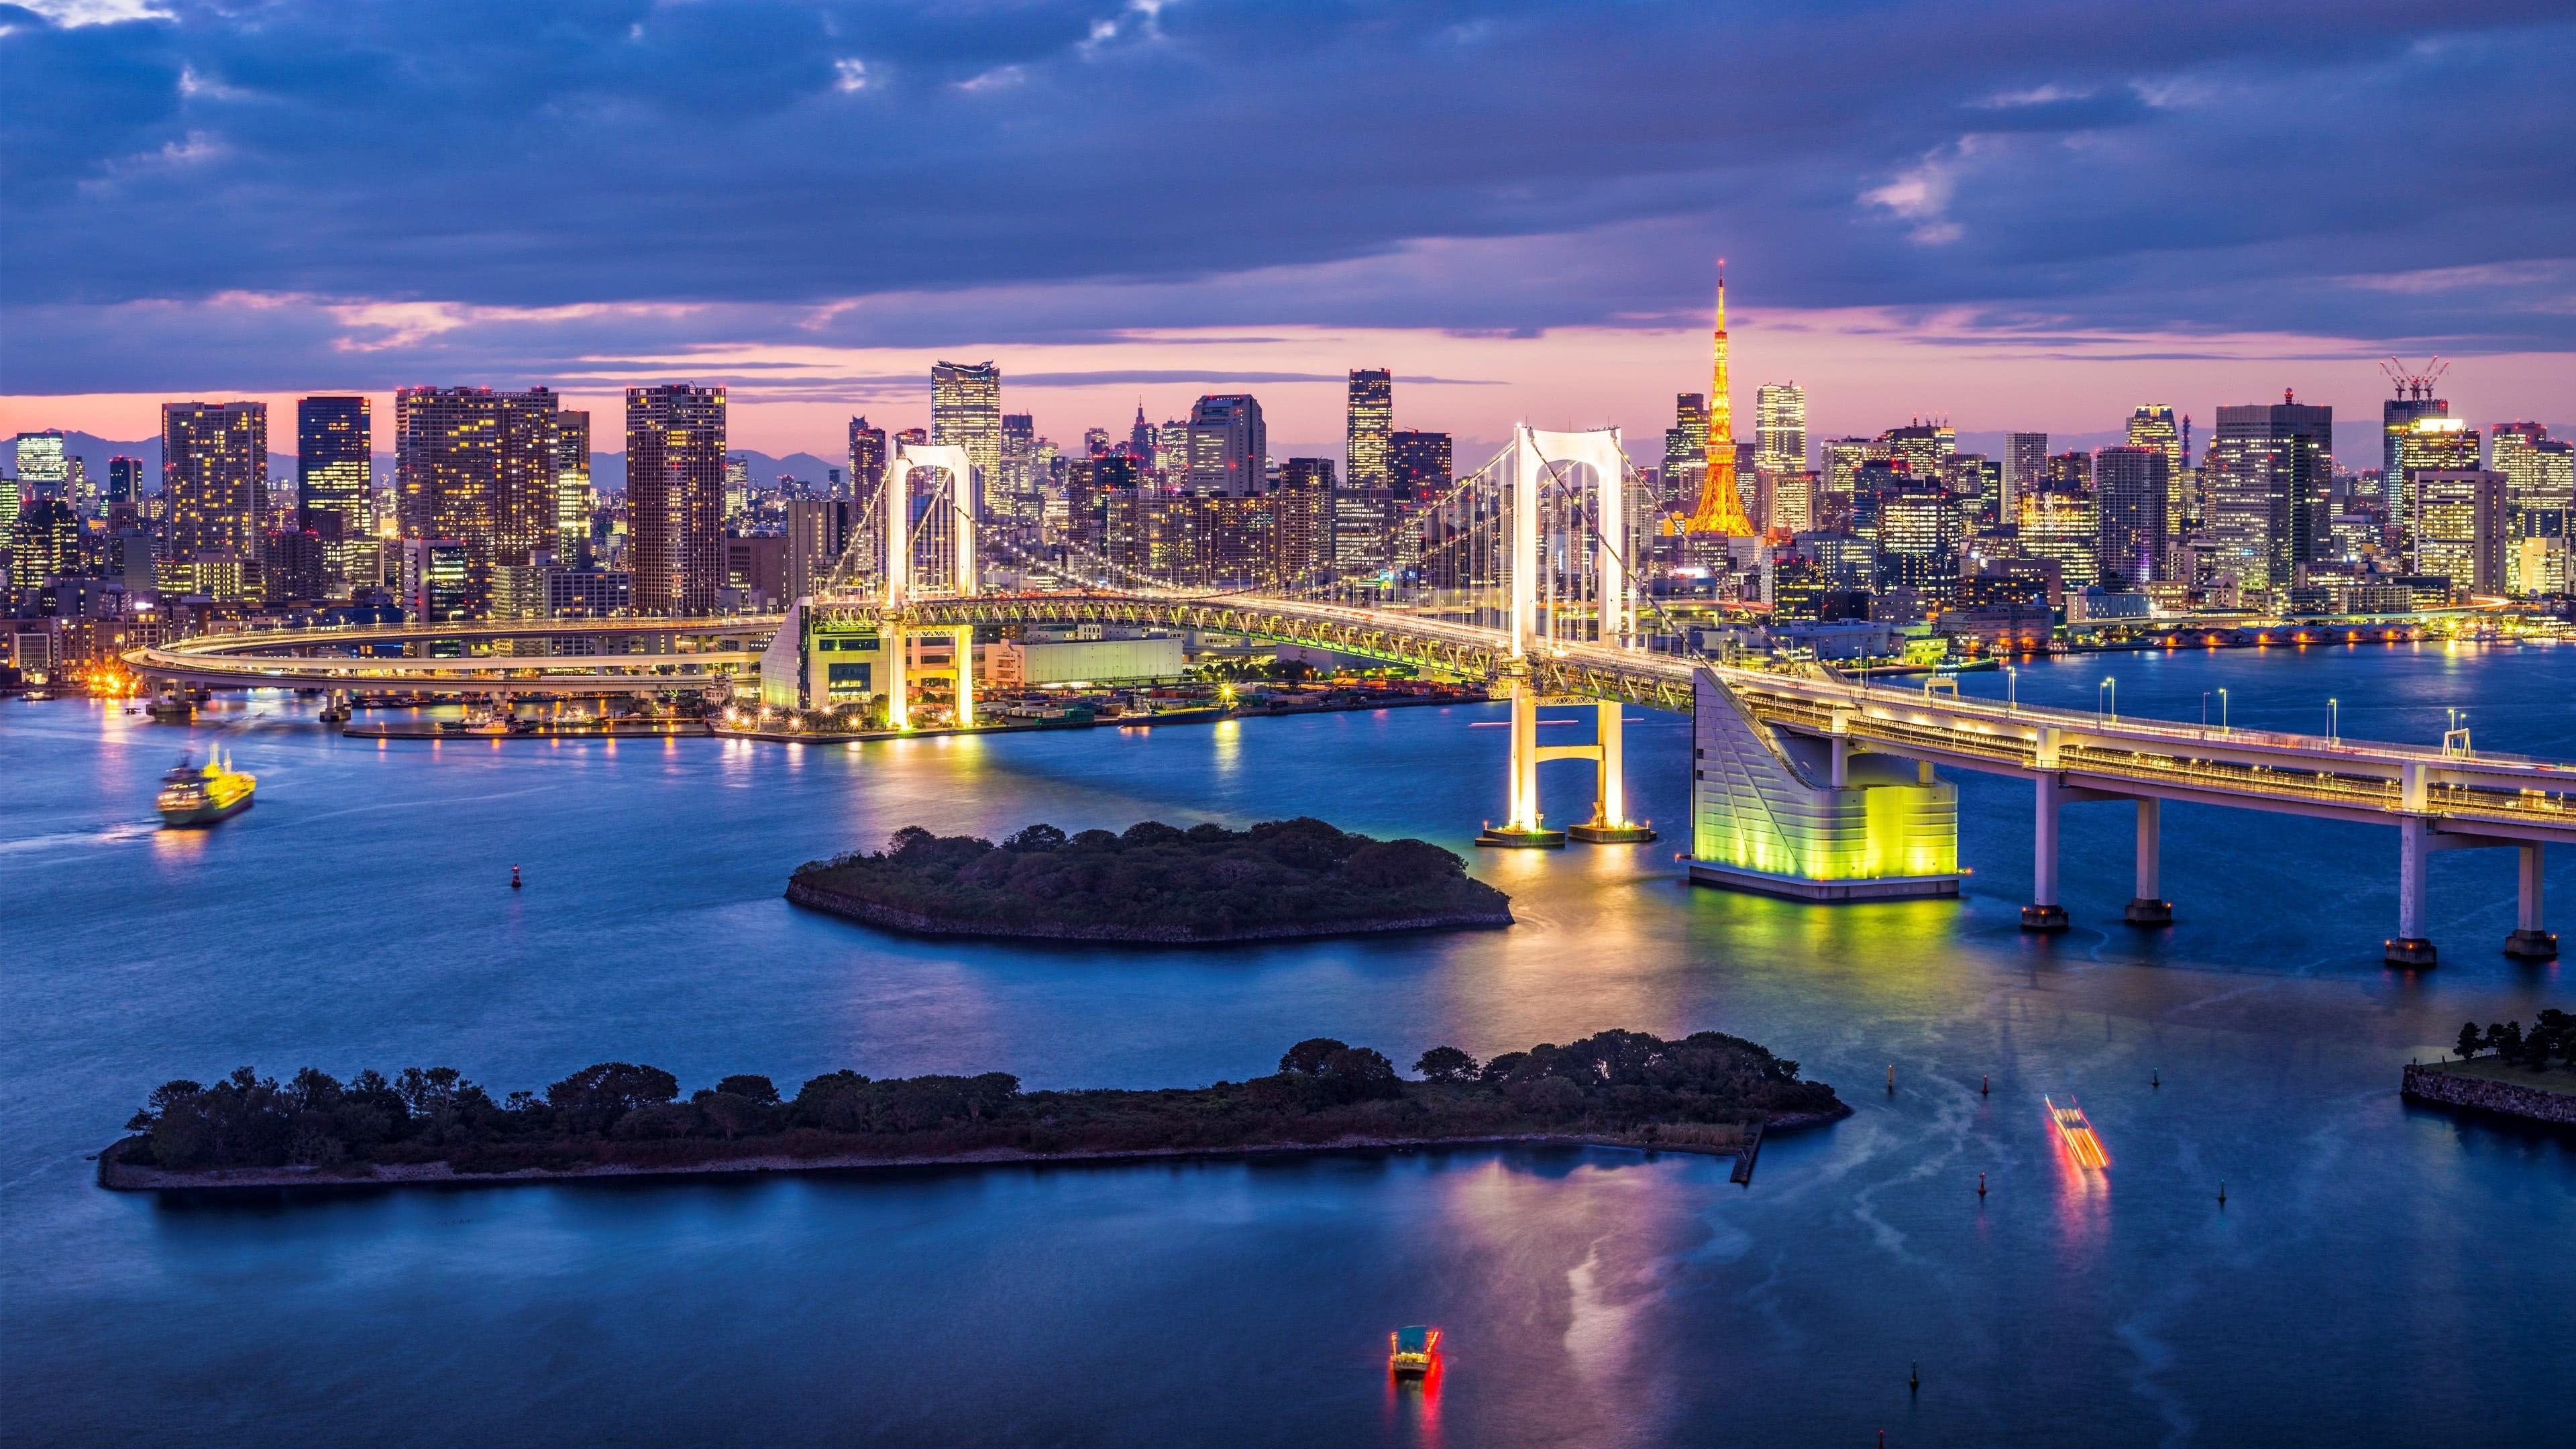 rainbow bridge tokyo japan uhd 4k wallpaper